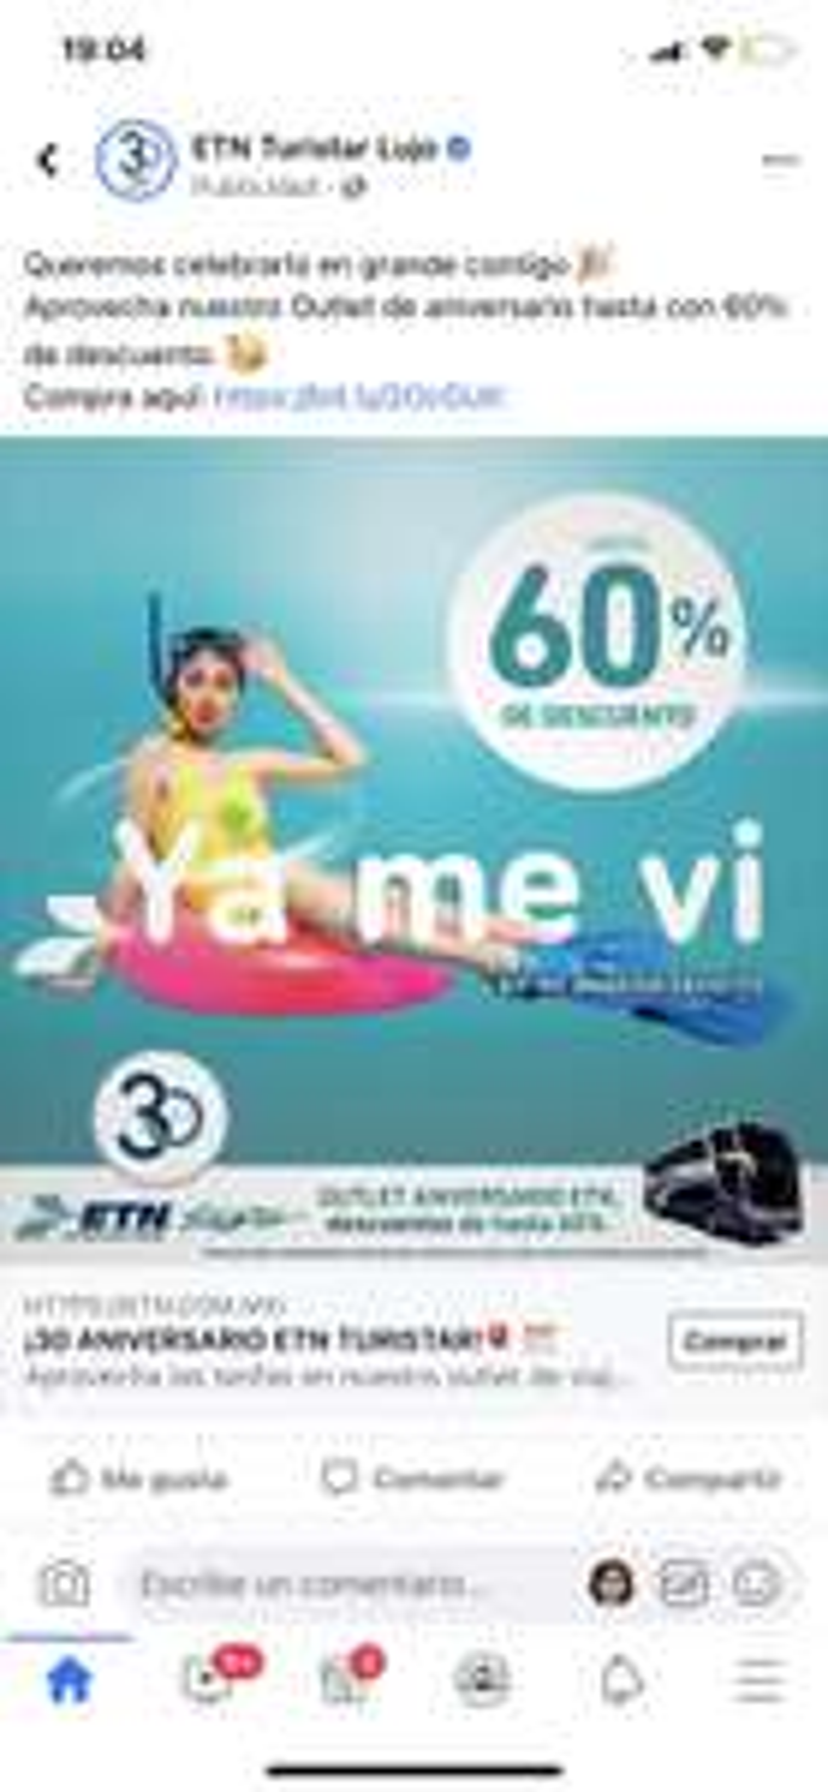 ETN: 60% de descuento por Outlet de 30 Aniversario